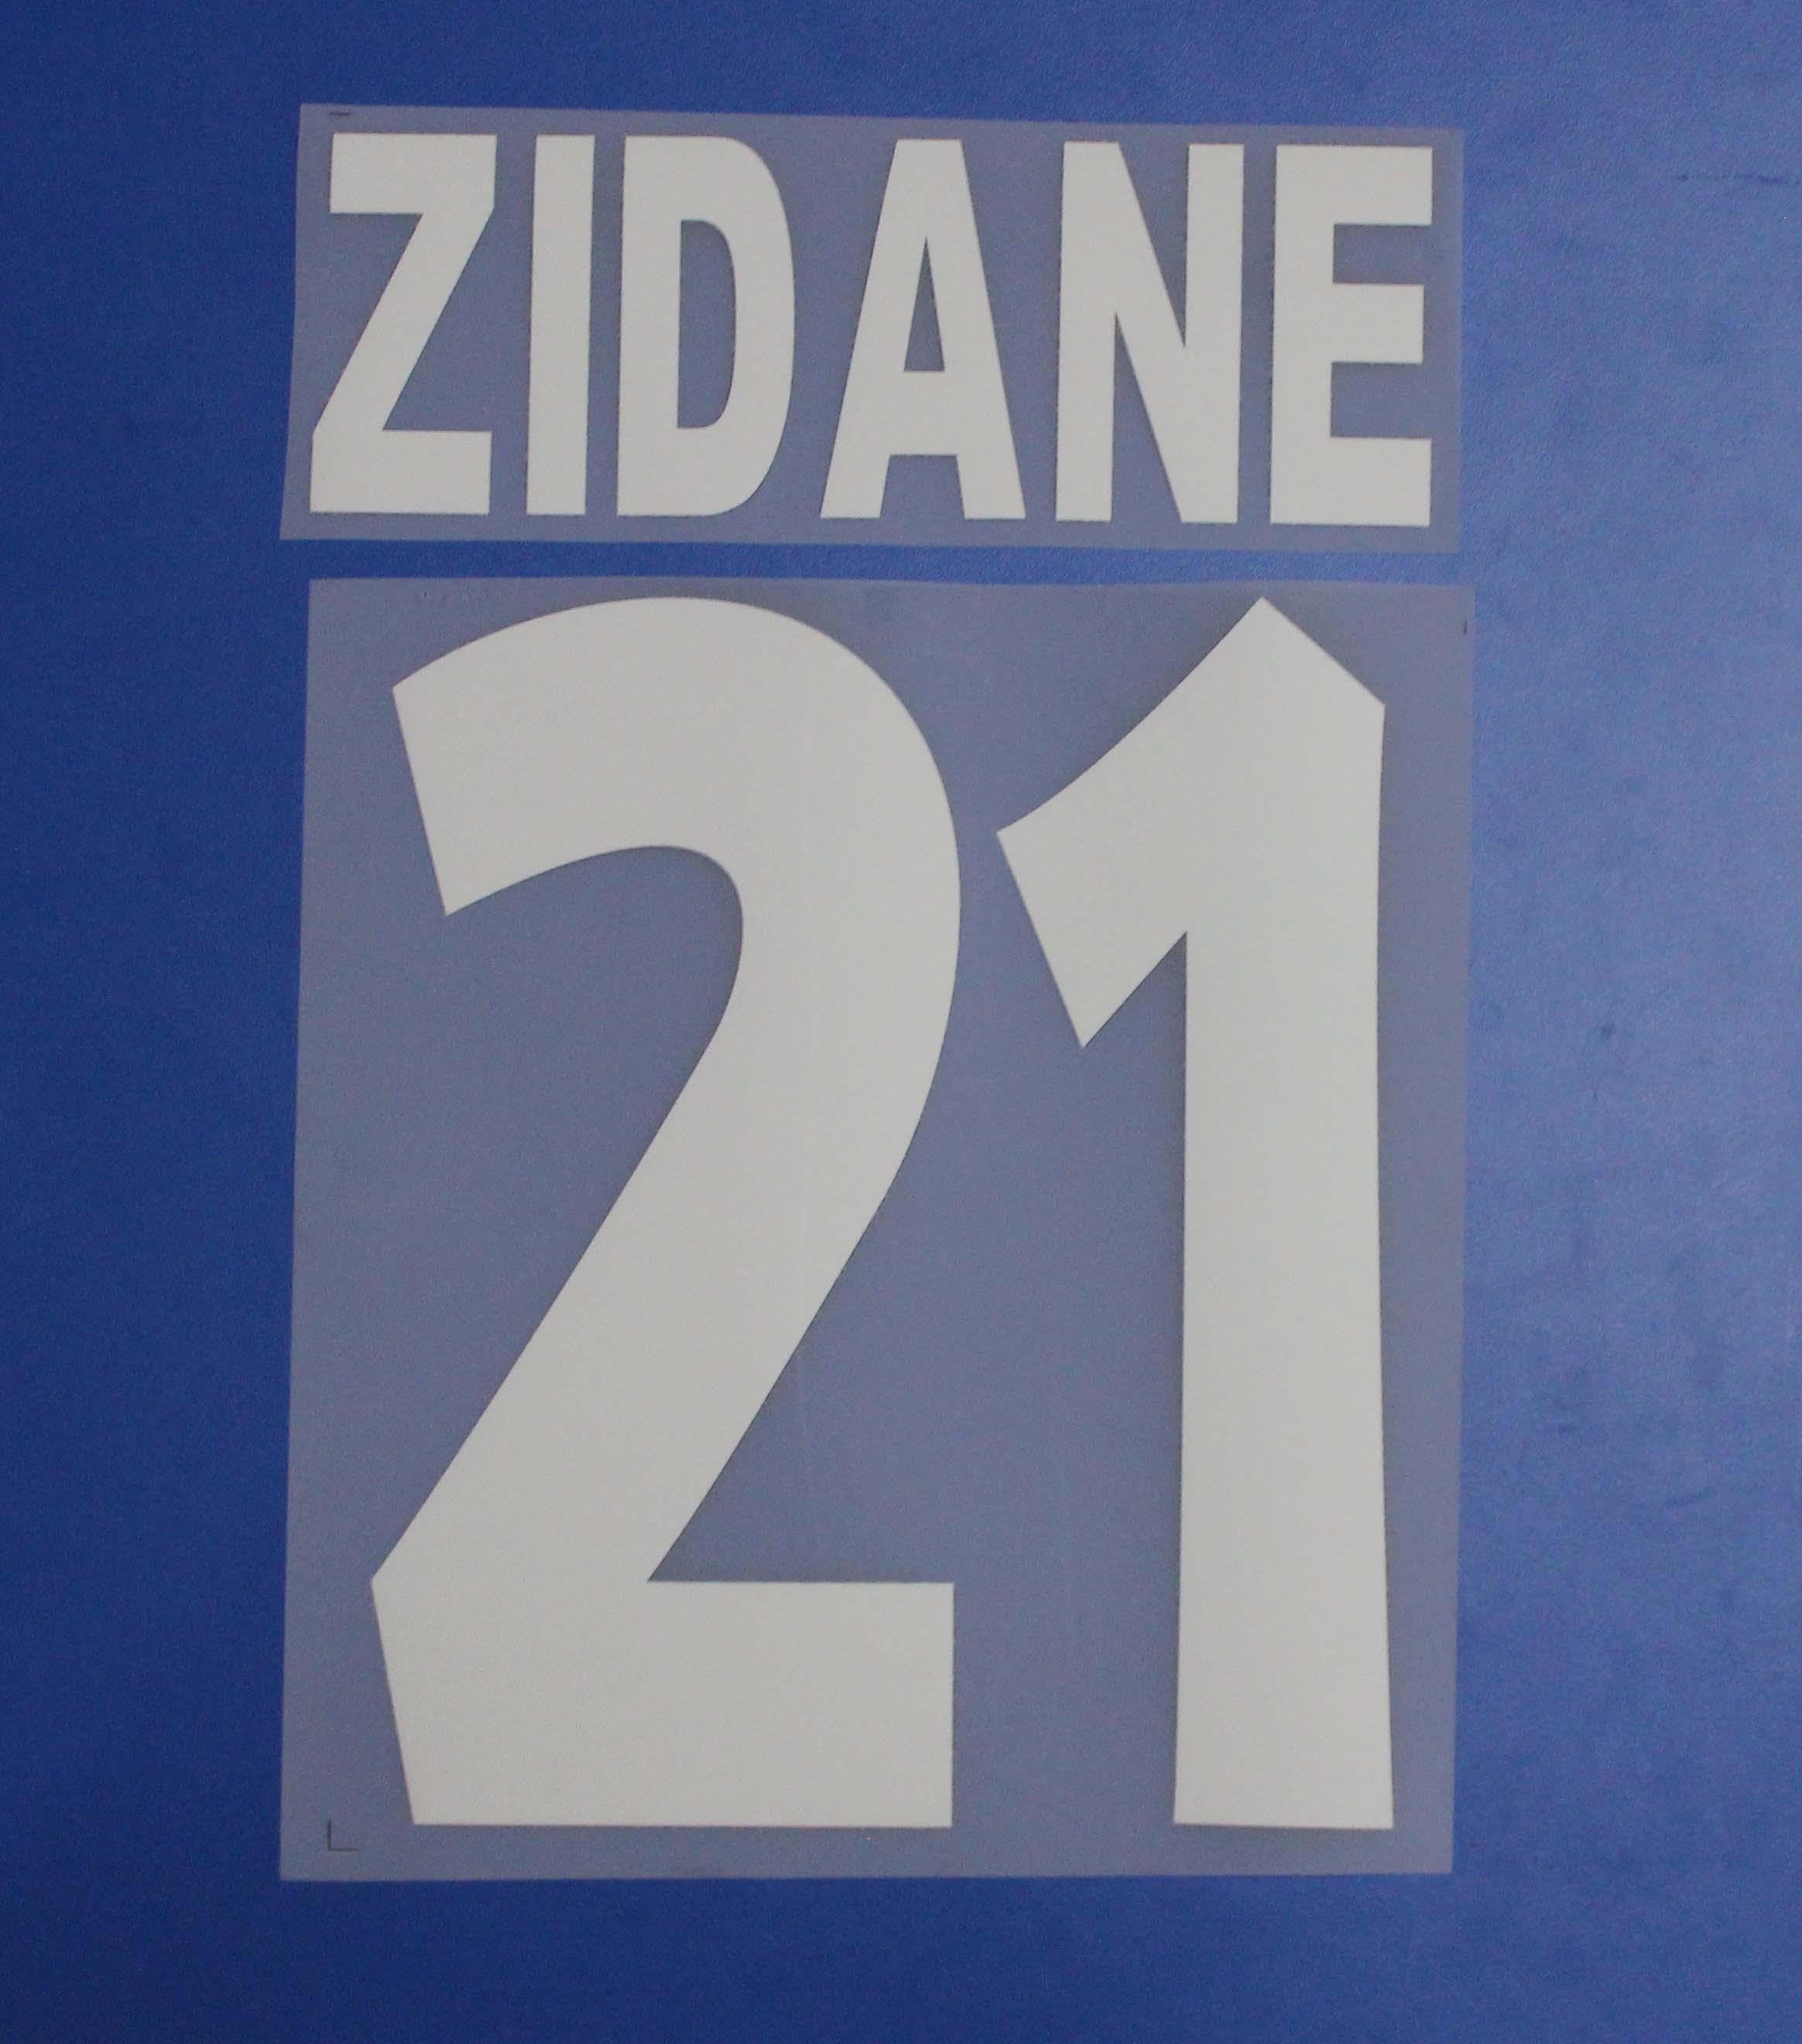 Zidane Retro Futbol Adet A-Z Sayı 0-9 Printng Futbol Yazı Futbol Yama